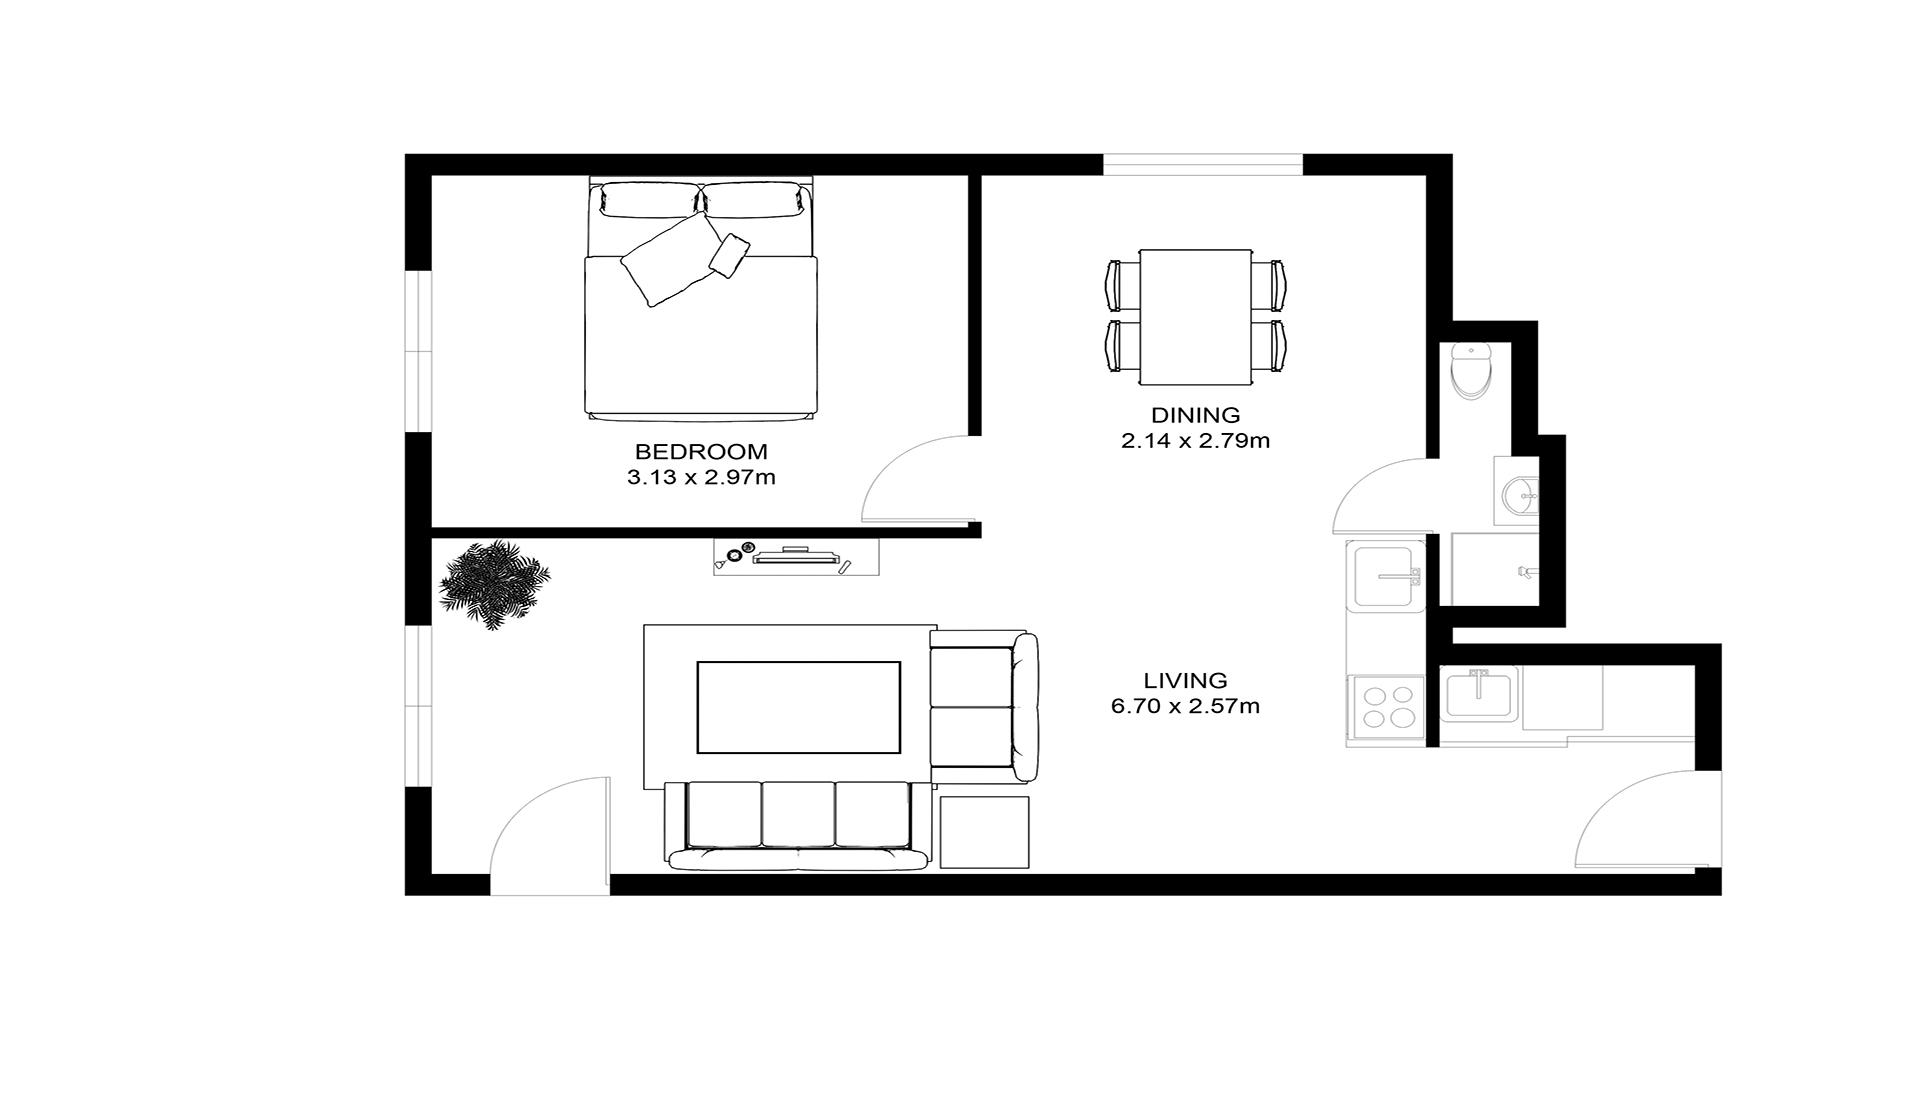 2D Black And White Full Furniture